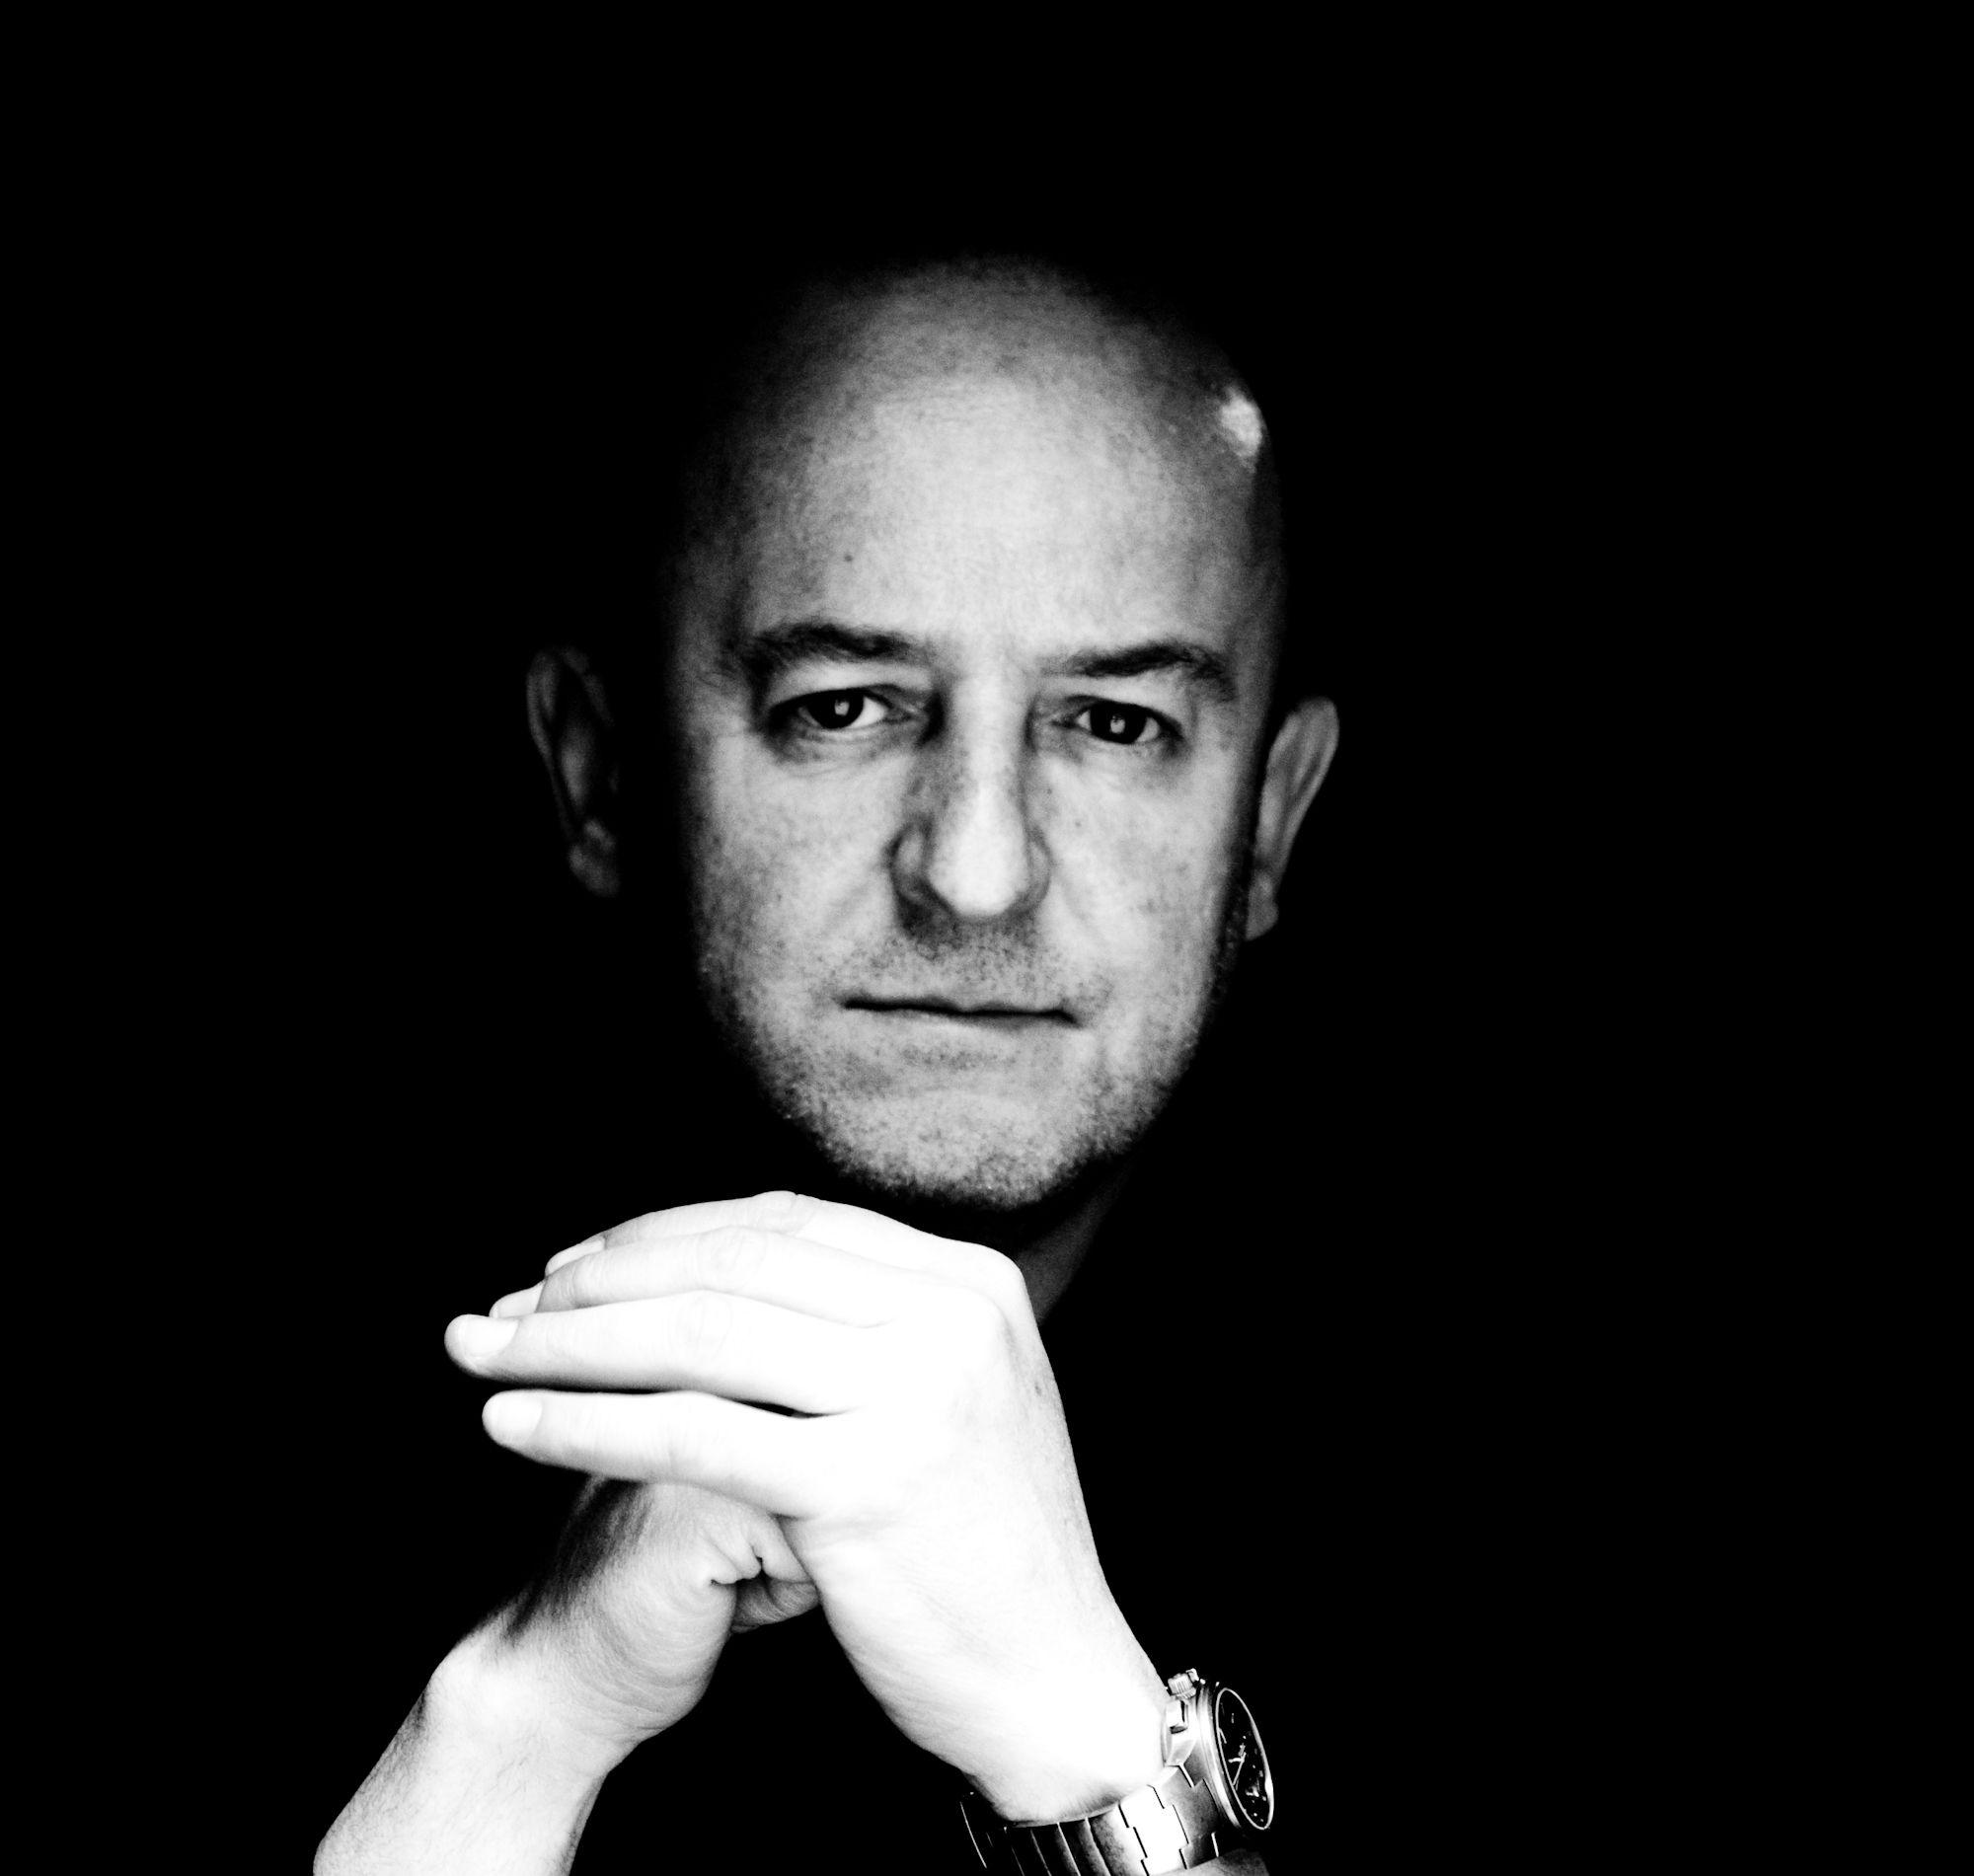 Xavier Casellas / Damian Galli